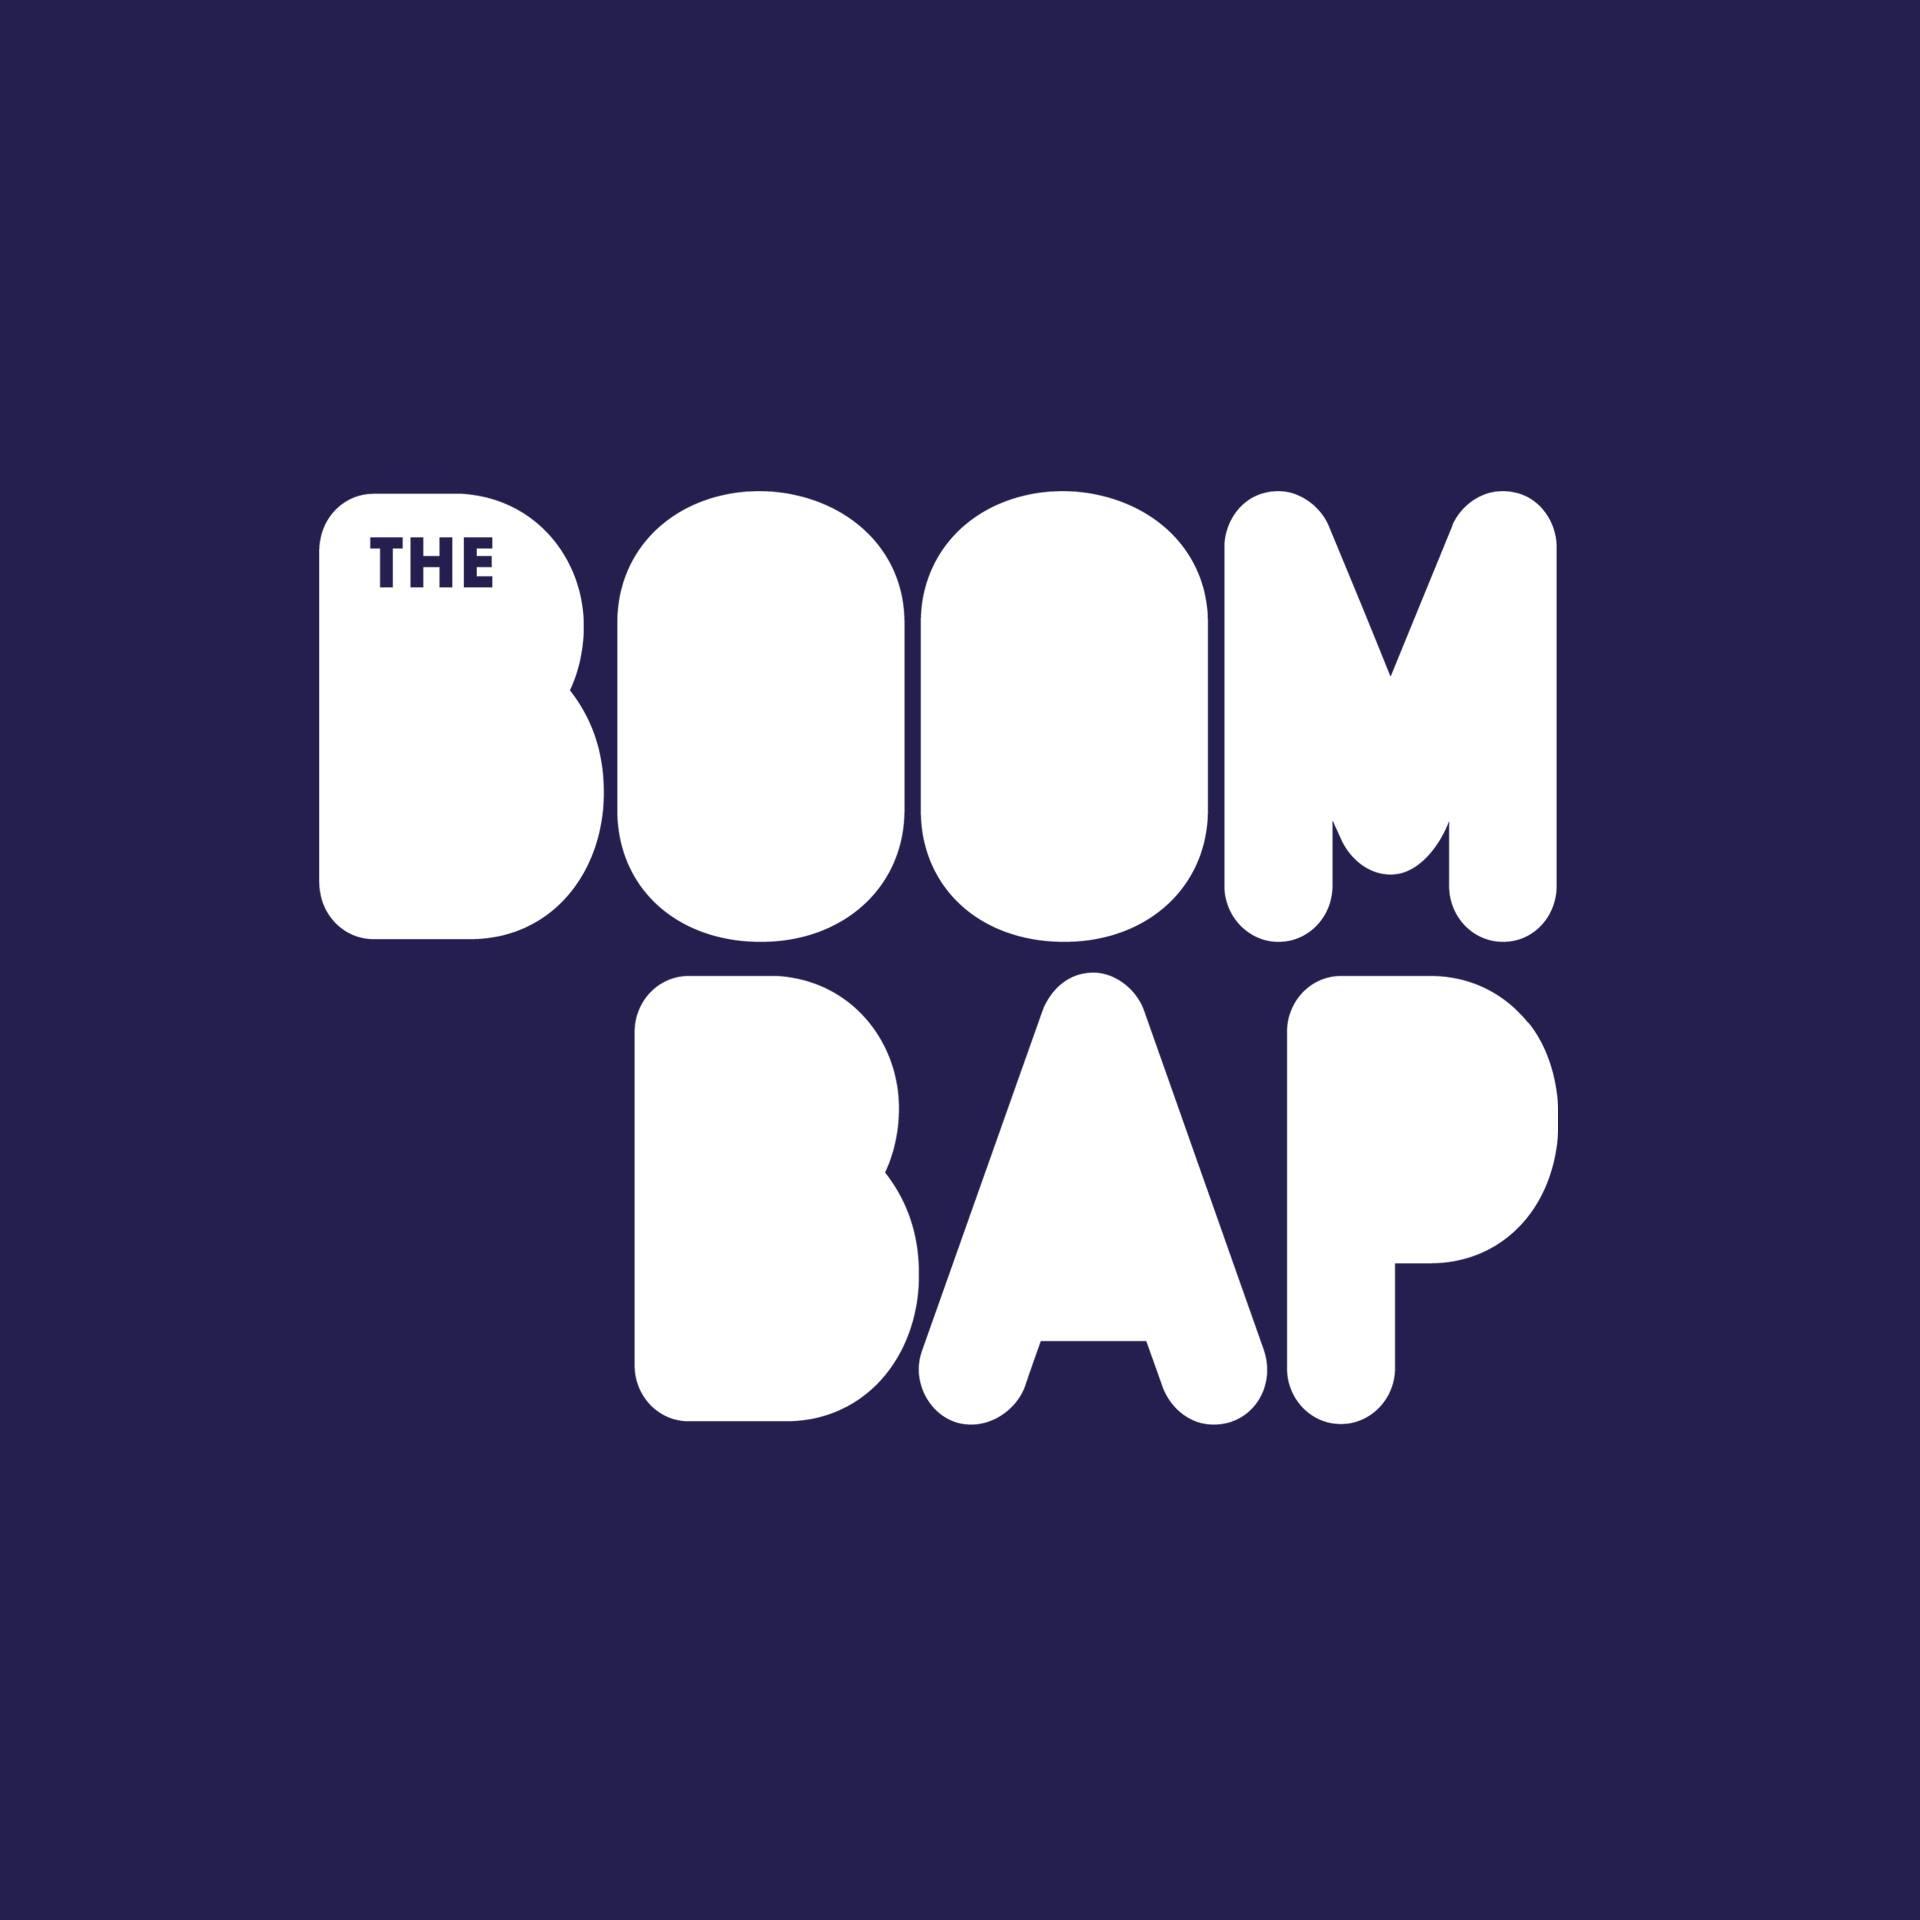 The Boom Bap: